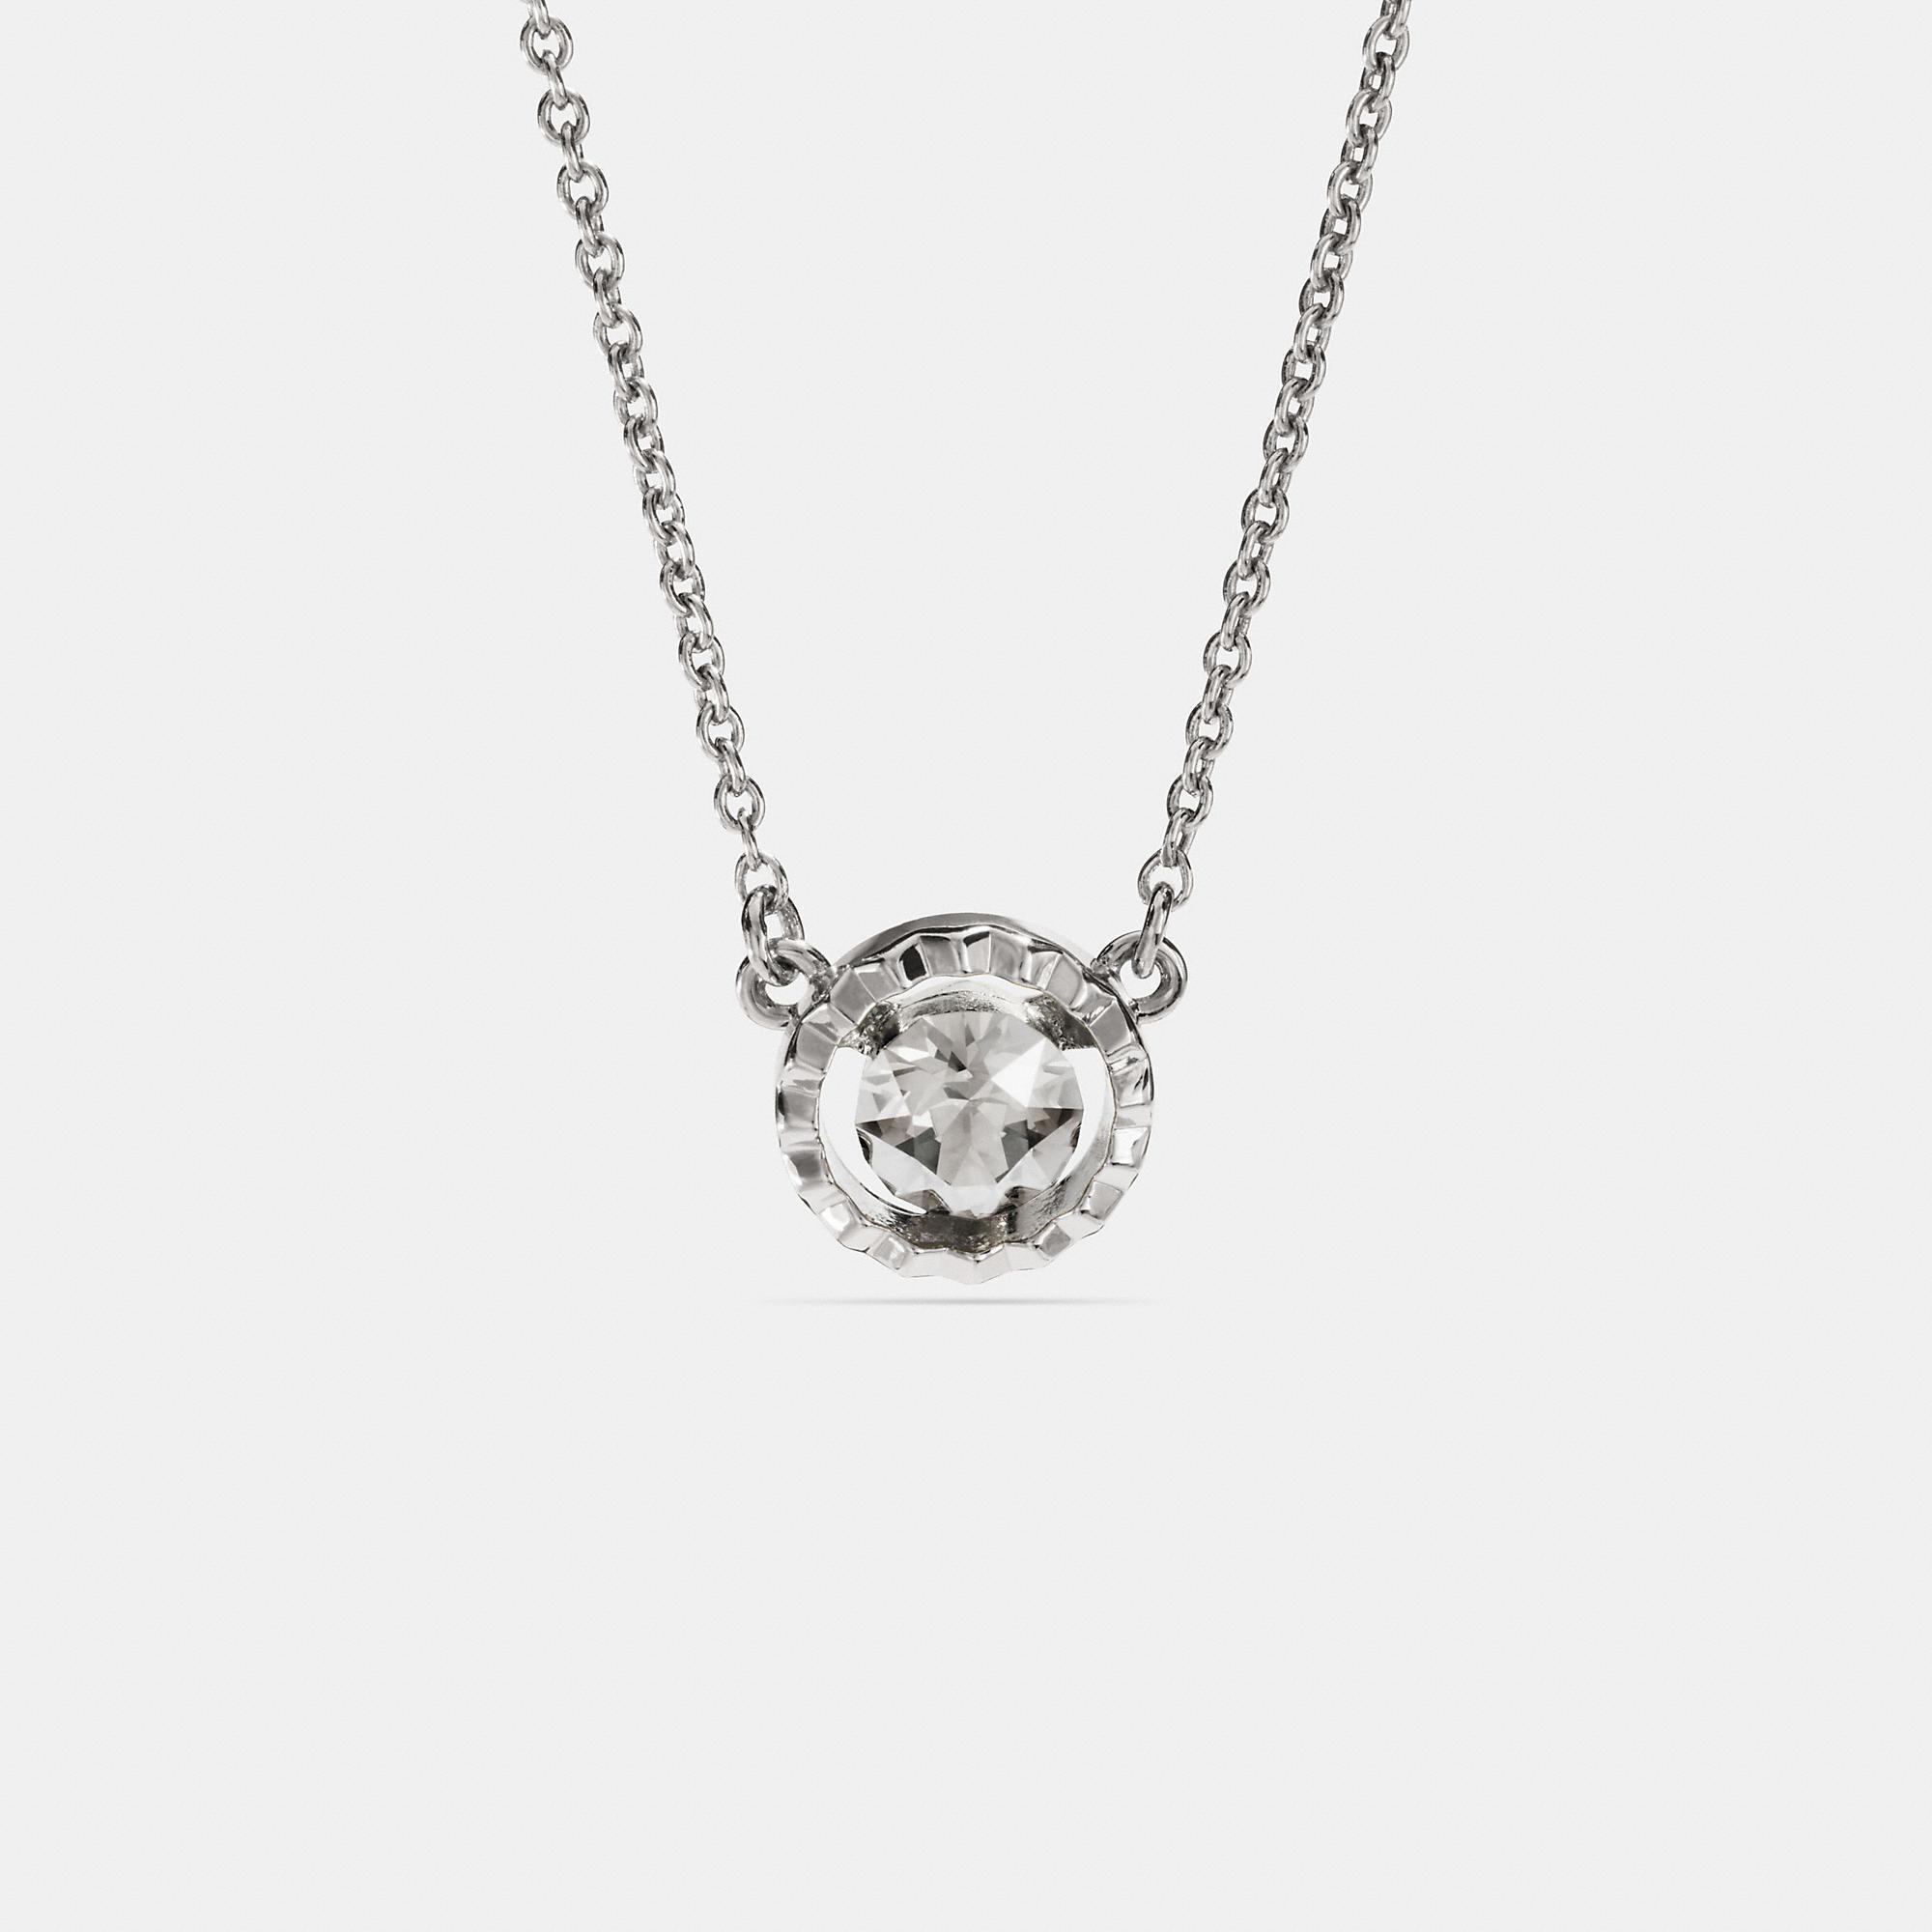 Coach Sunburst Necklace In Silver